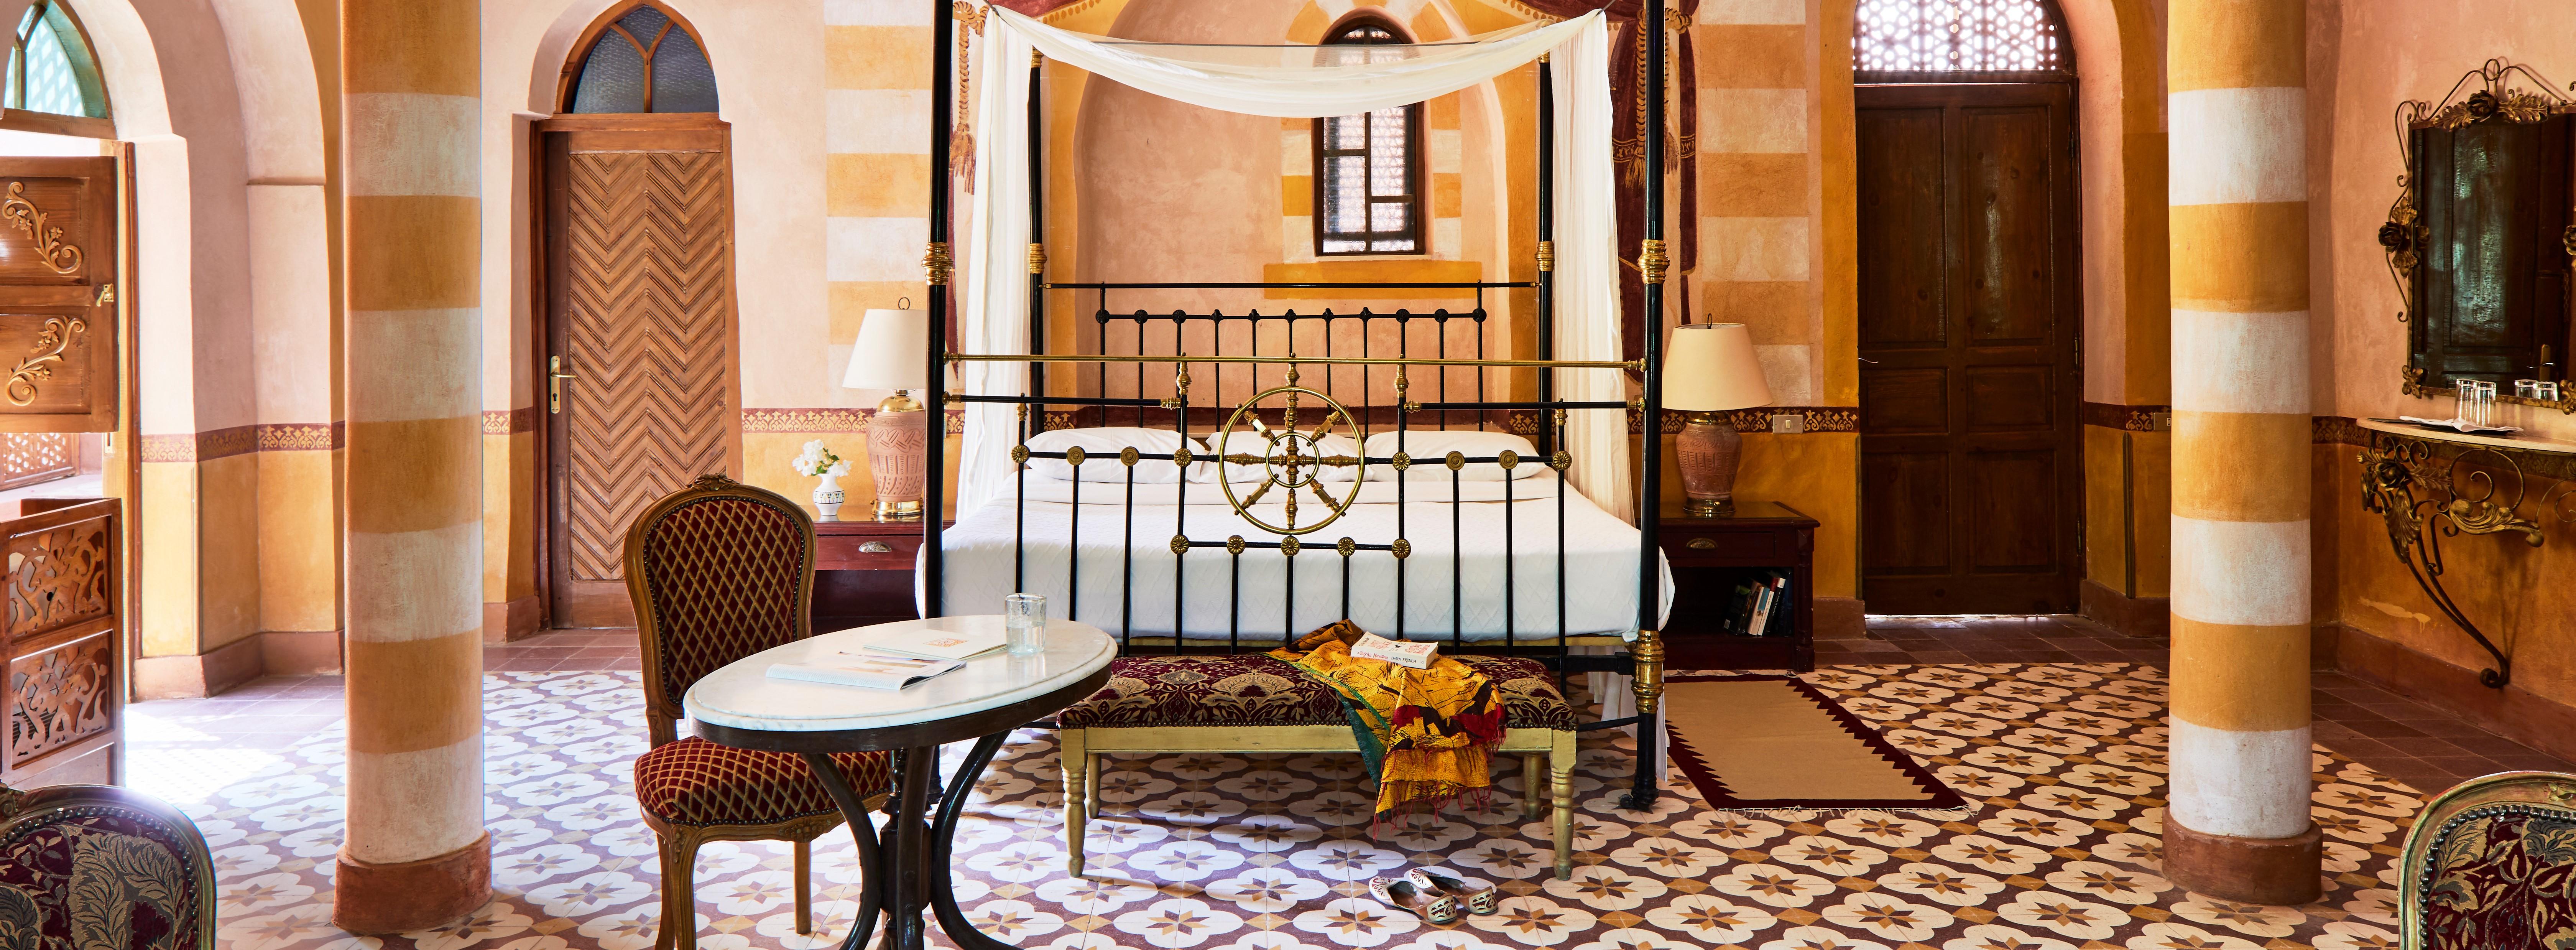 al-moudira-luxor-suite-3